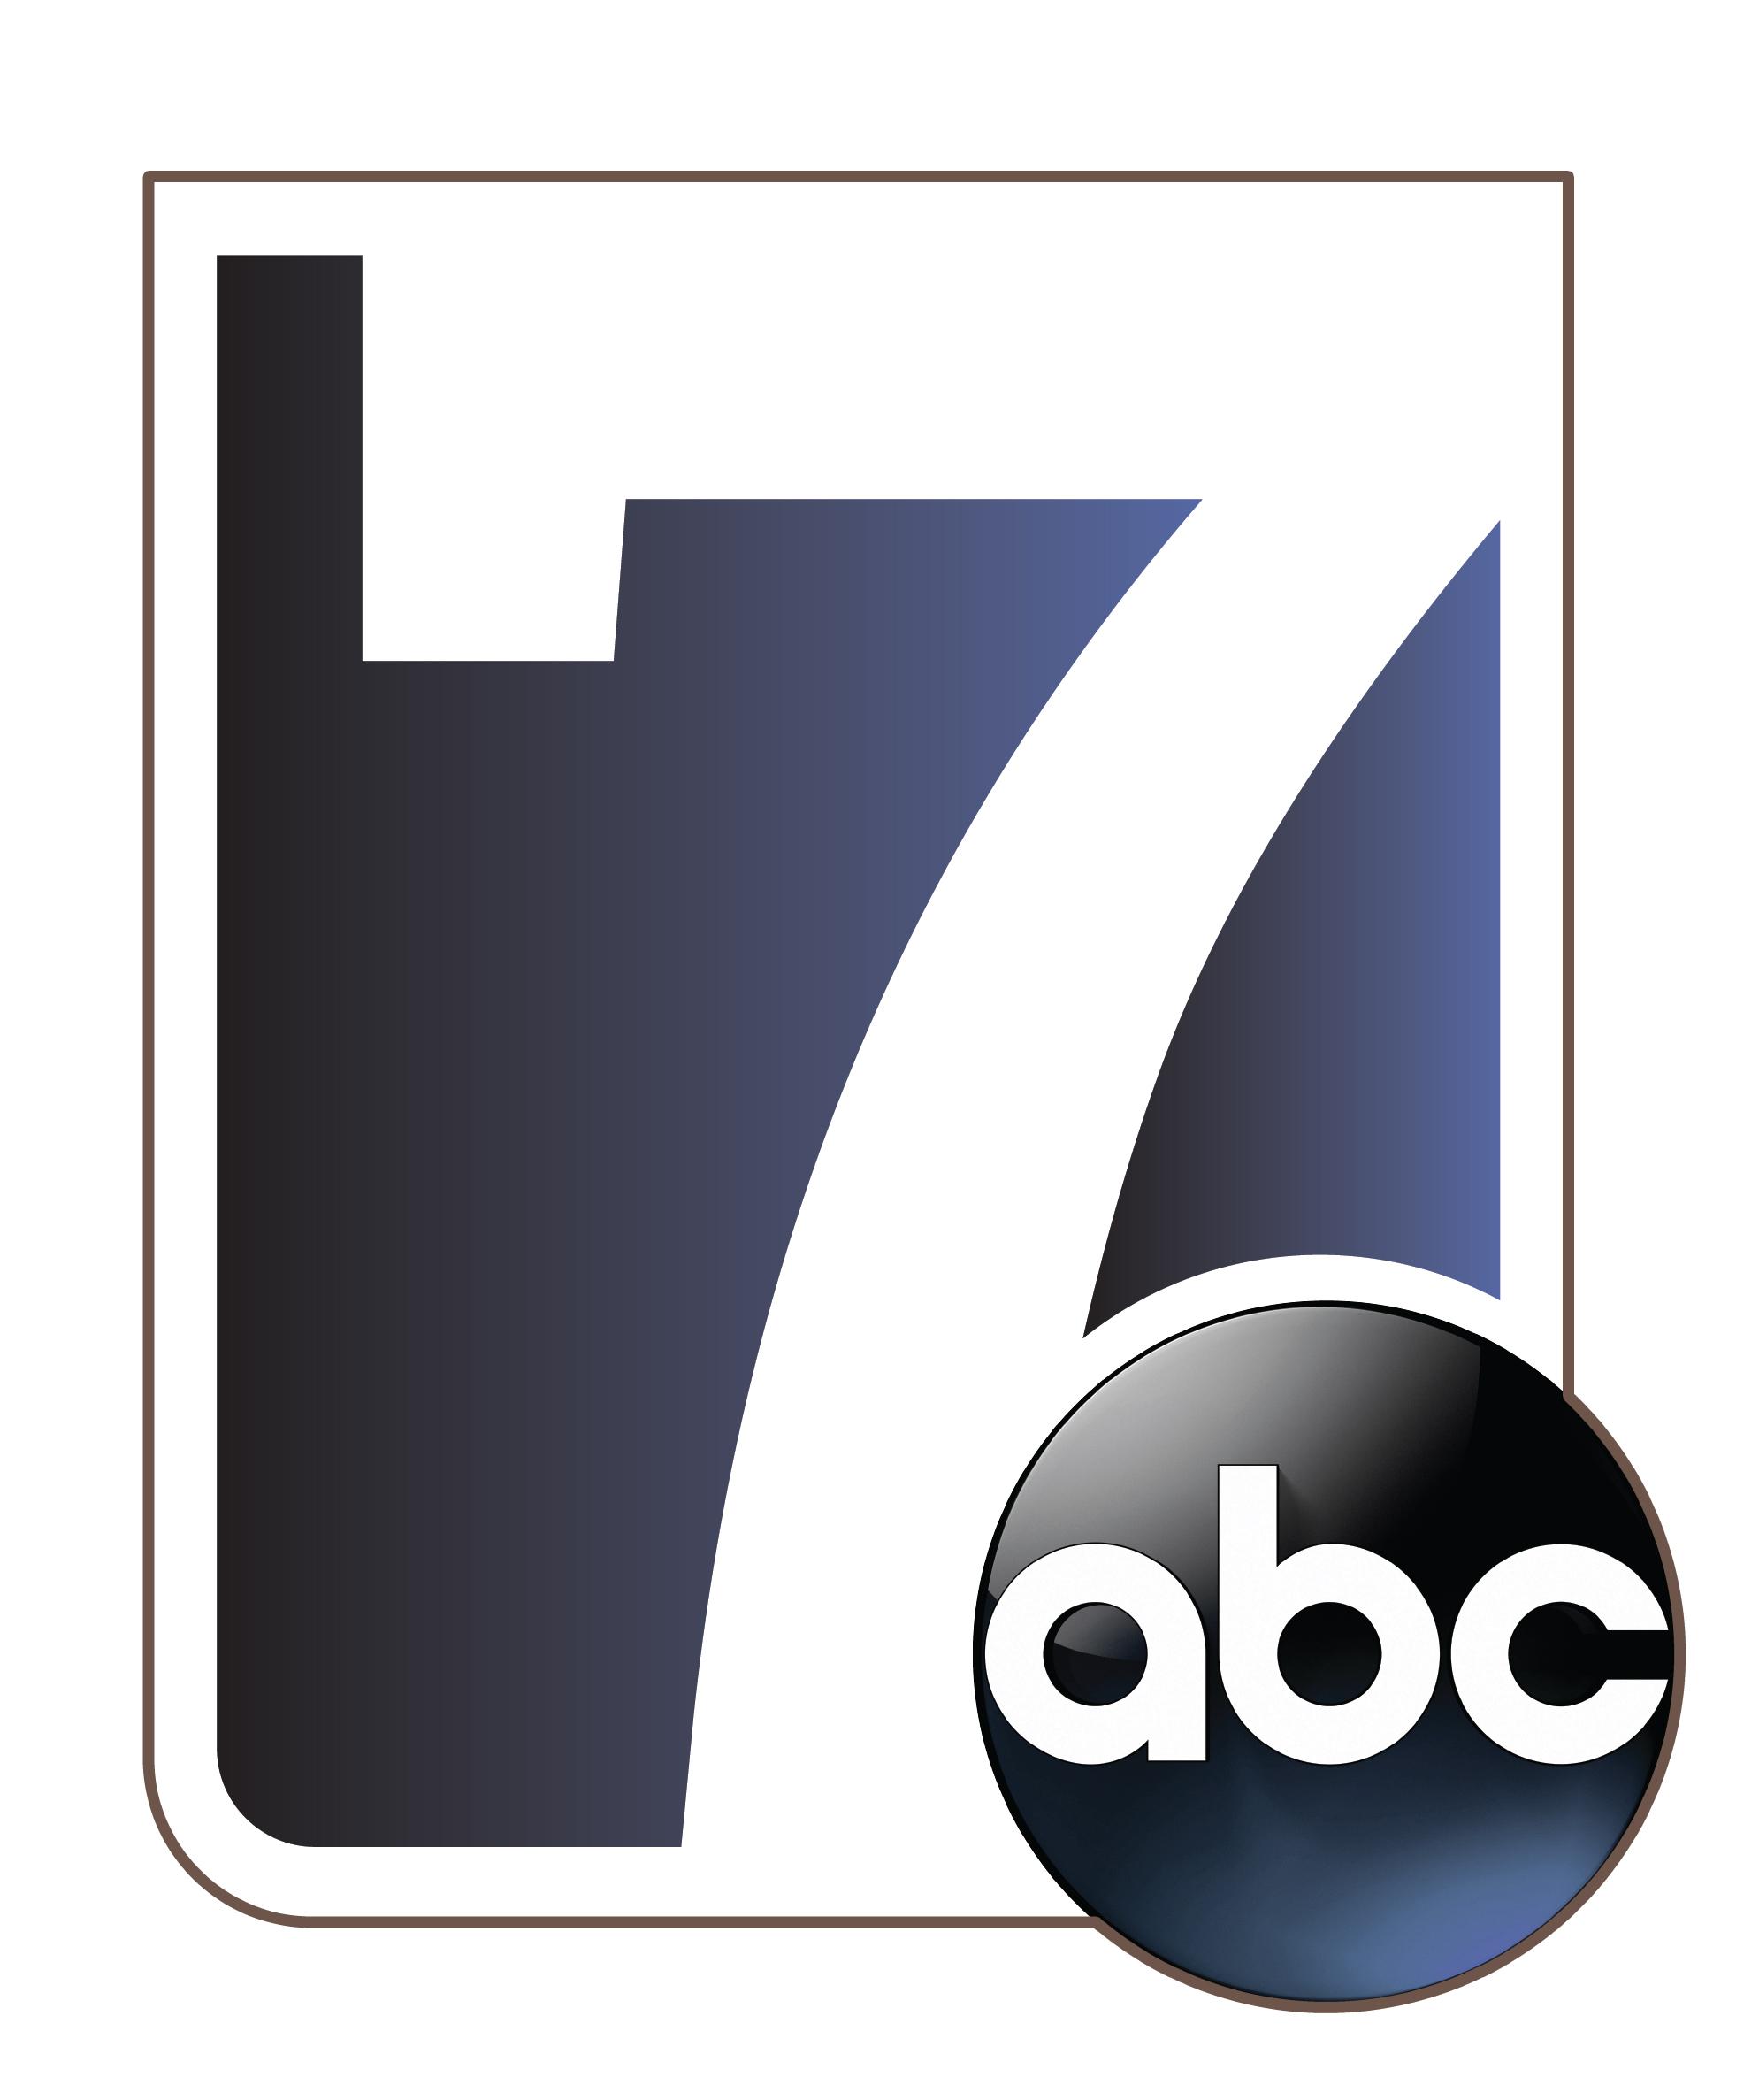 Channel 7 Bangor logo